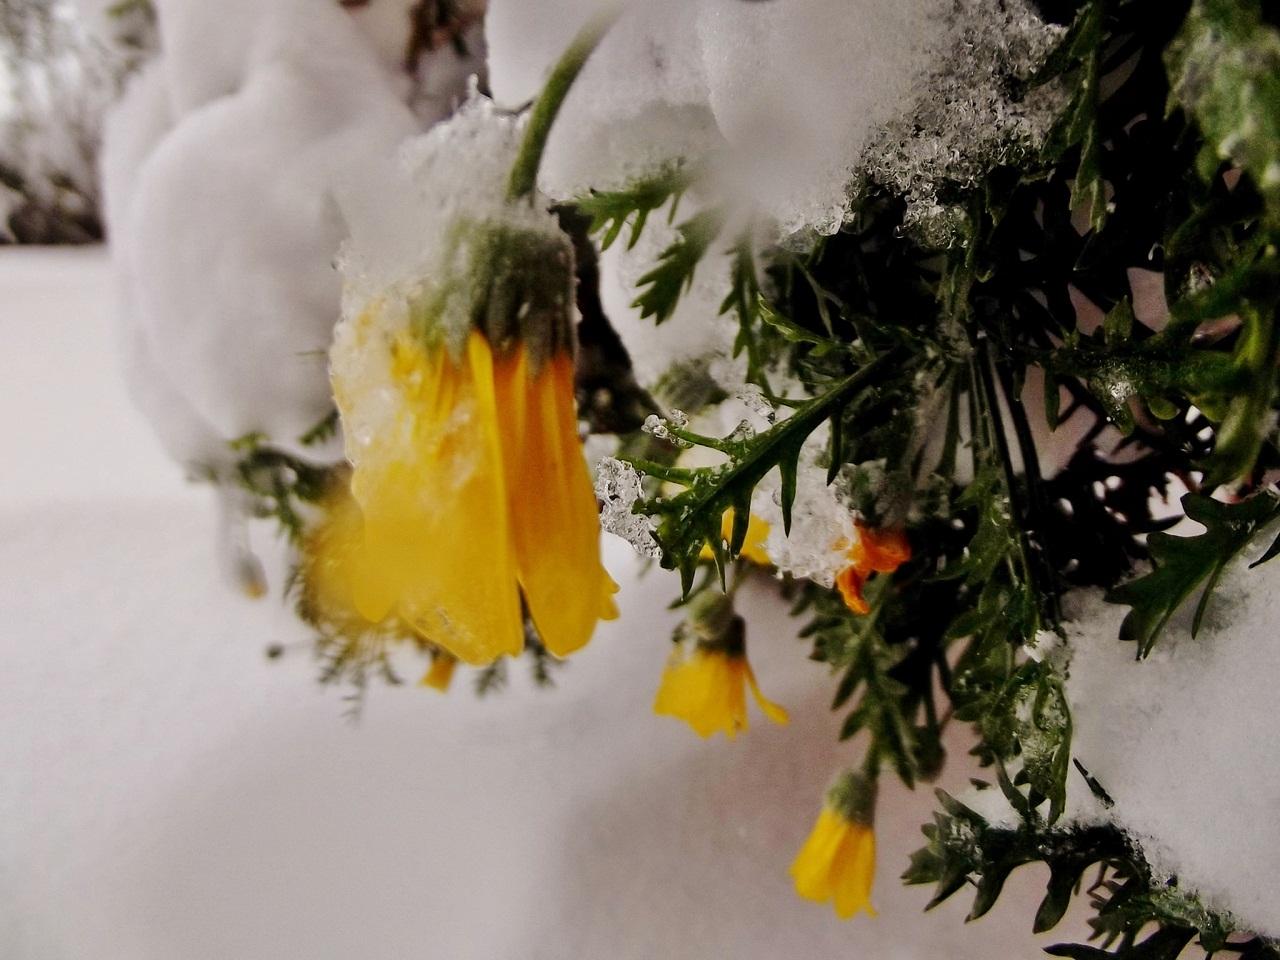 La neve tra racconti proverbi e poesie cronache maceratesi margherite di letizia bernabei altavistaventures Image collections